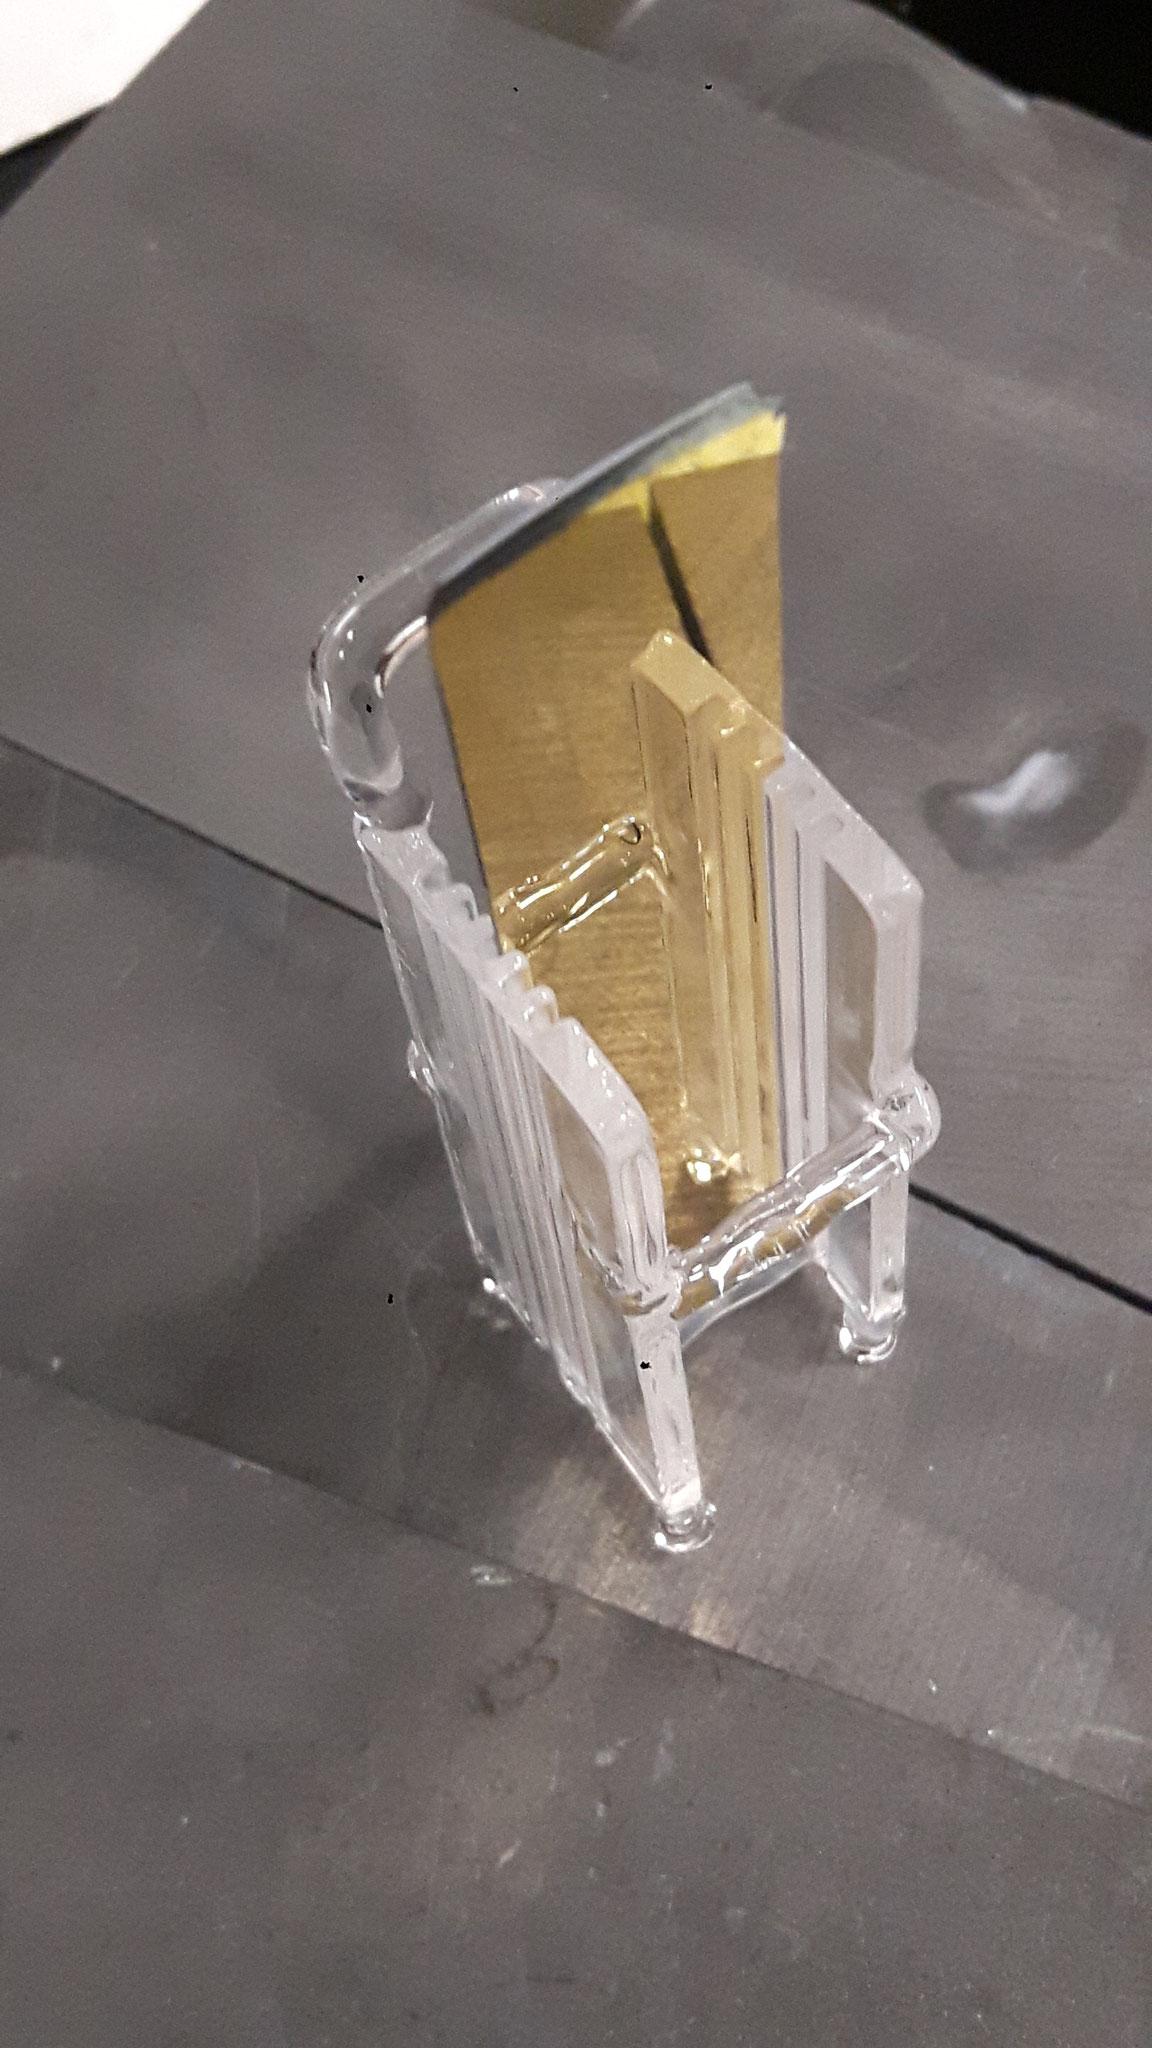 sample holder, quartzglass